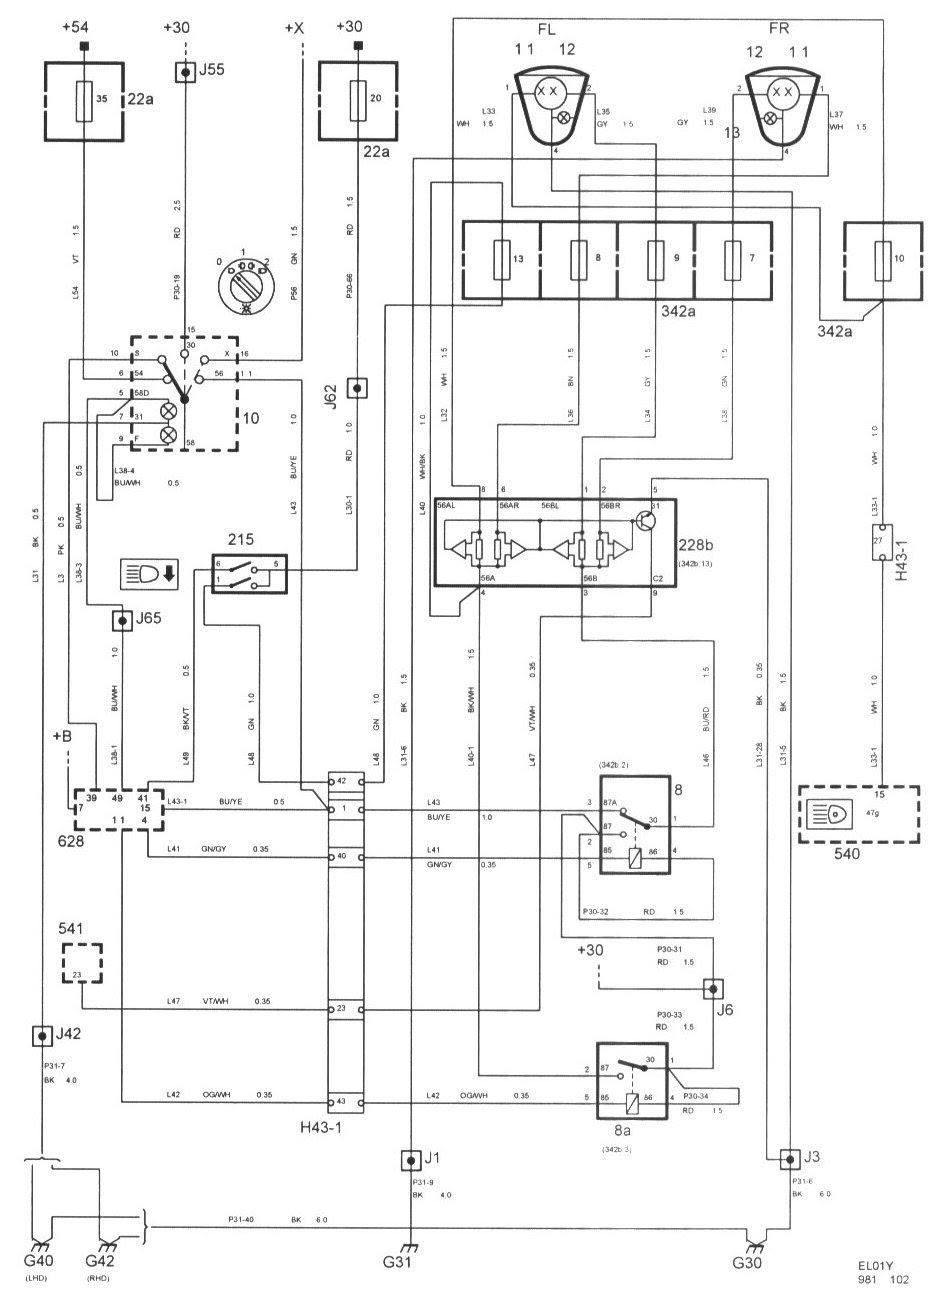 Saab 9 3 Wiring Xs400 Special Ii Engine Wiring Wirings Auto4 Ciluba Madfish It